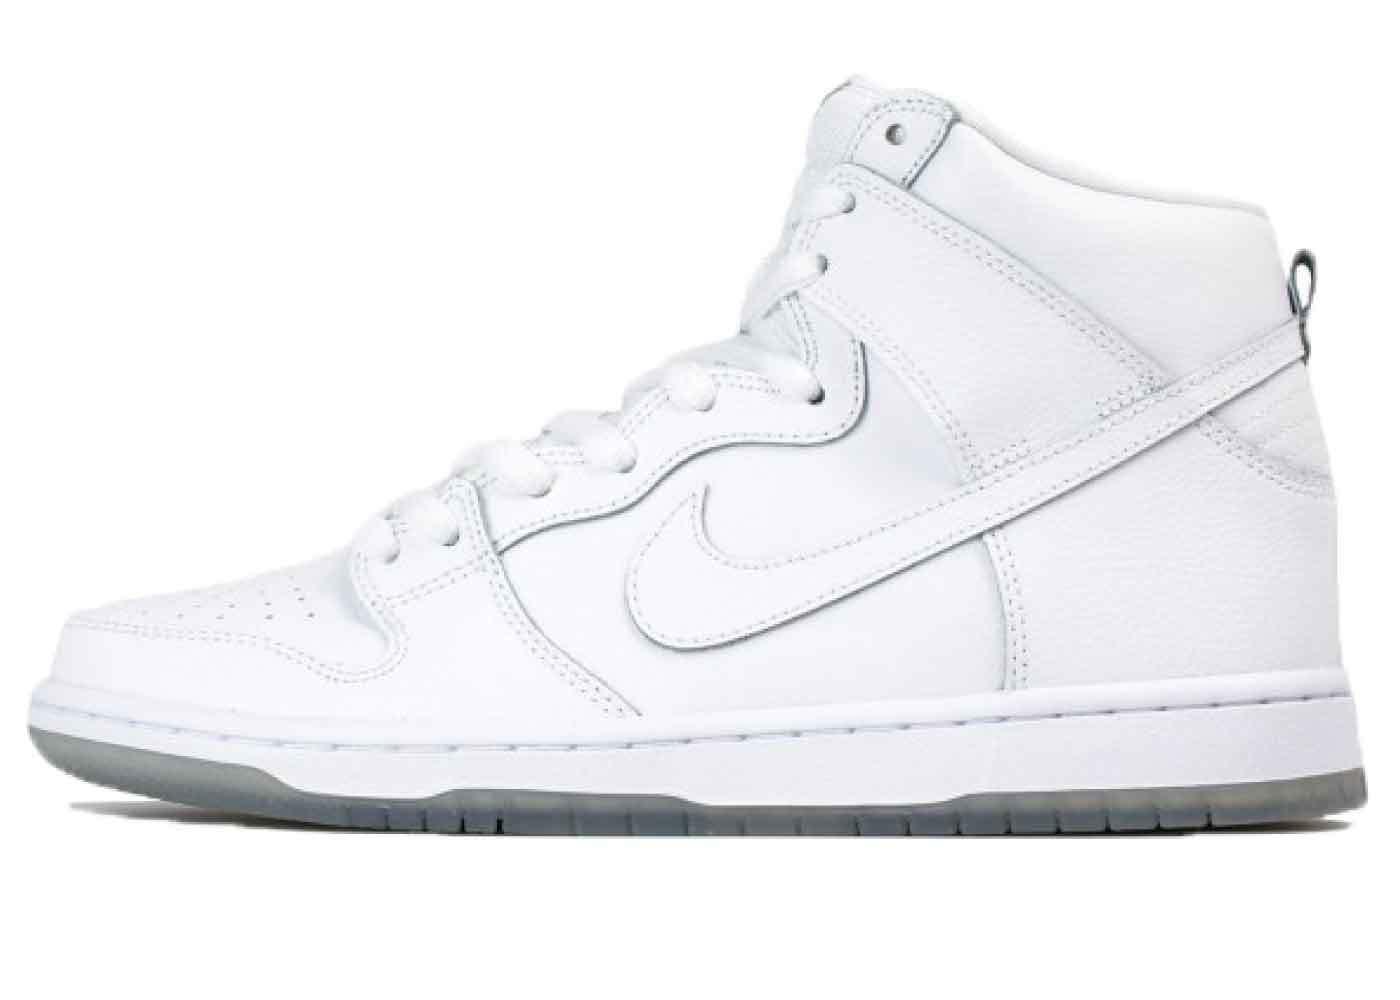 Nike SB Dunk High White Iceの写真